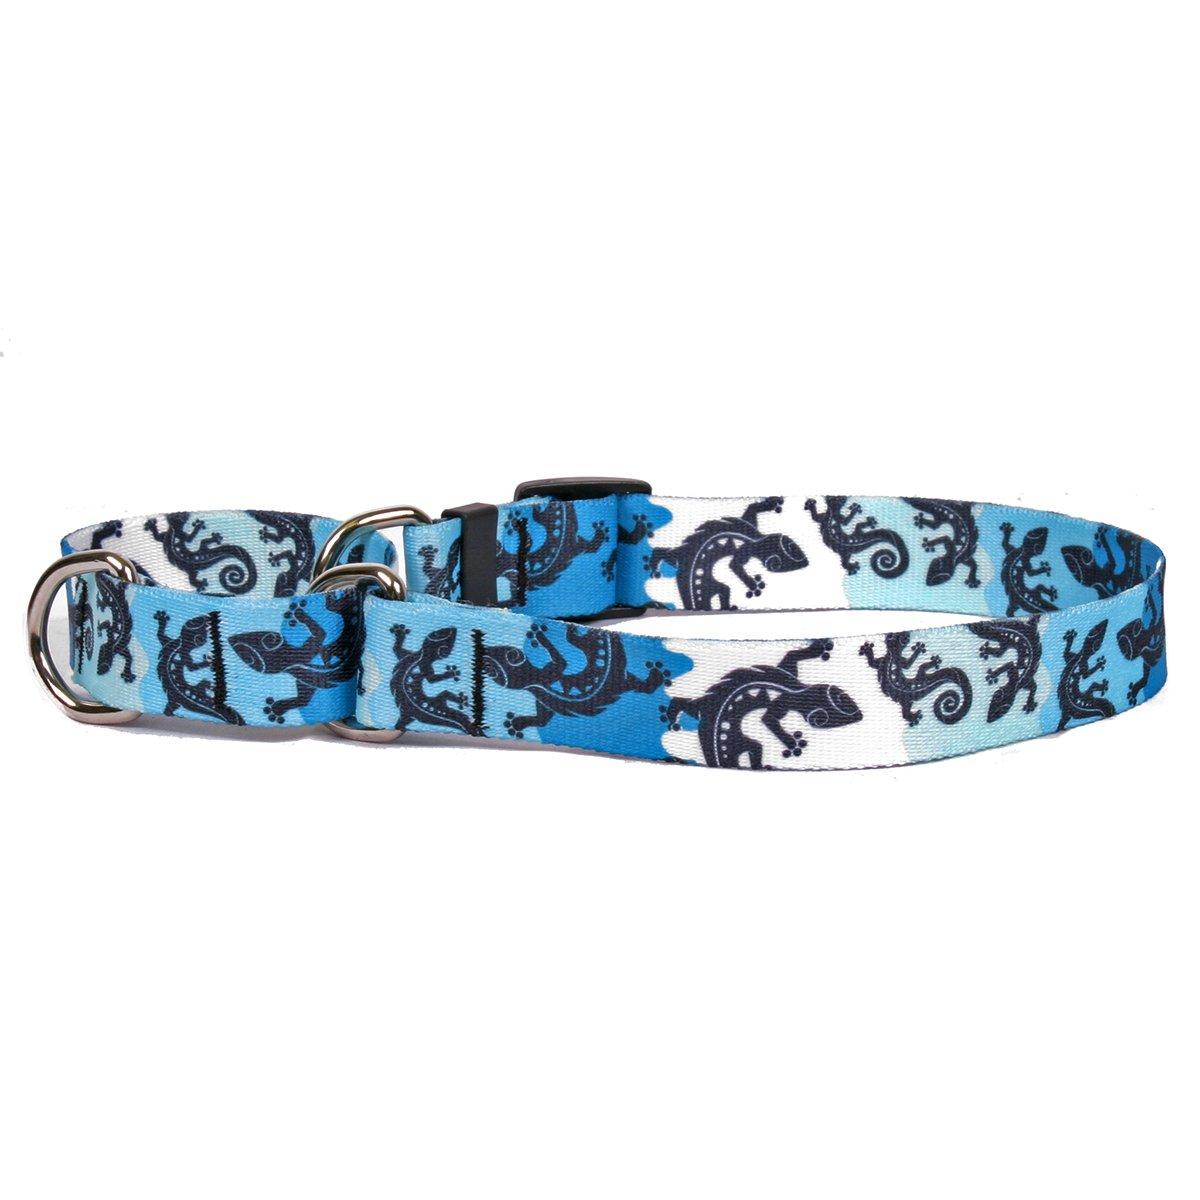 Yellow Dog Design Martingale Slip Collar, Geckos Teal, Large 27''